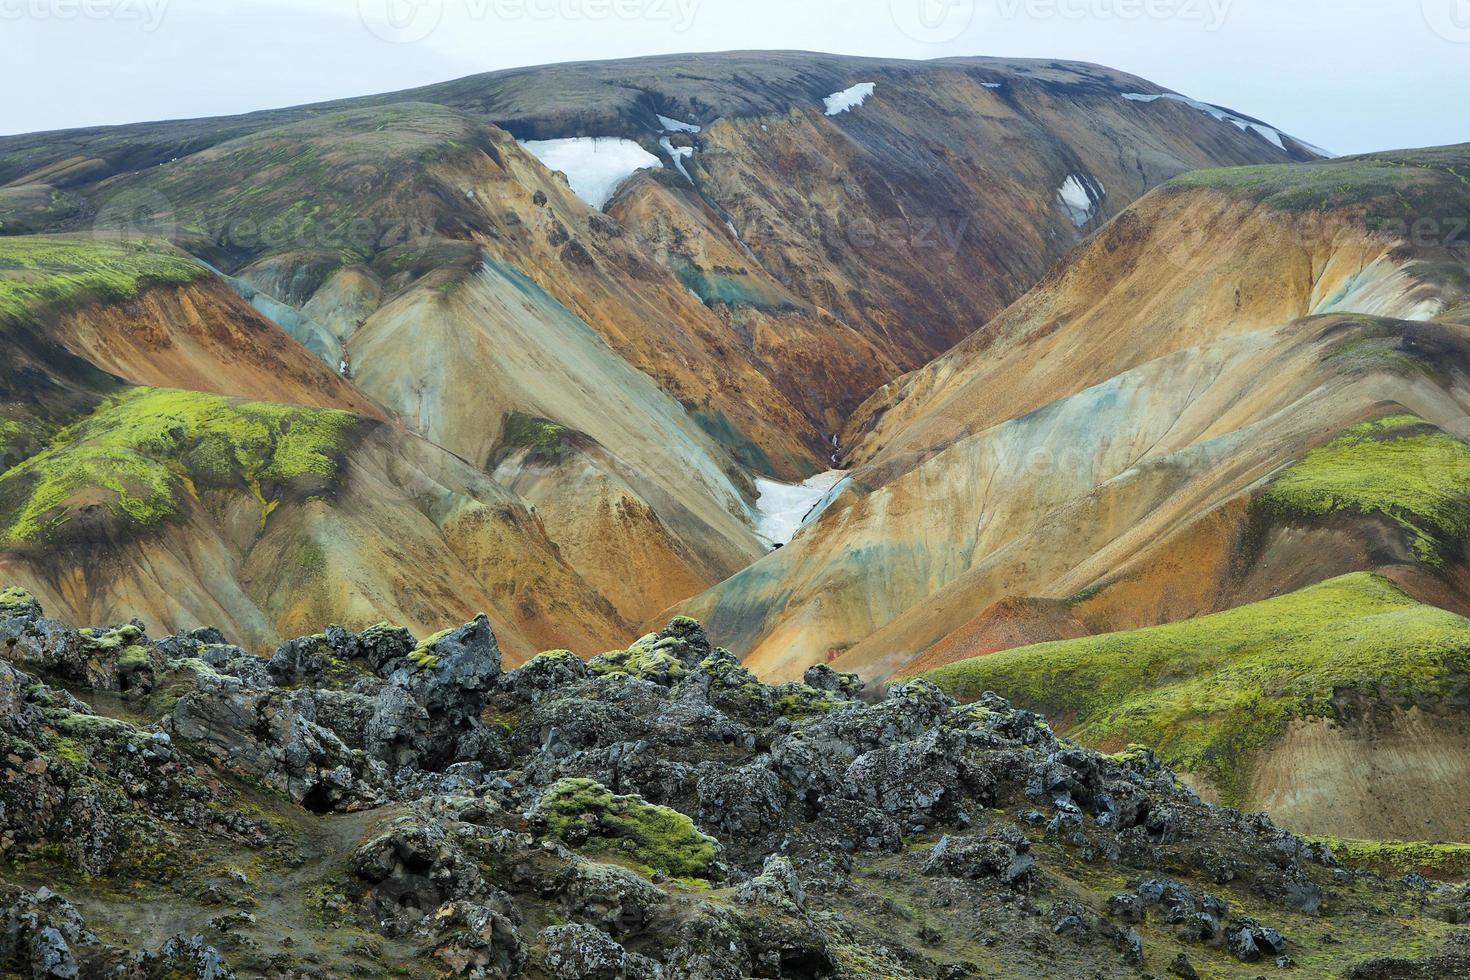 montagne multicolori a landmannalaugar, foto